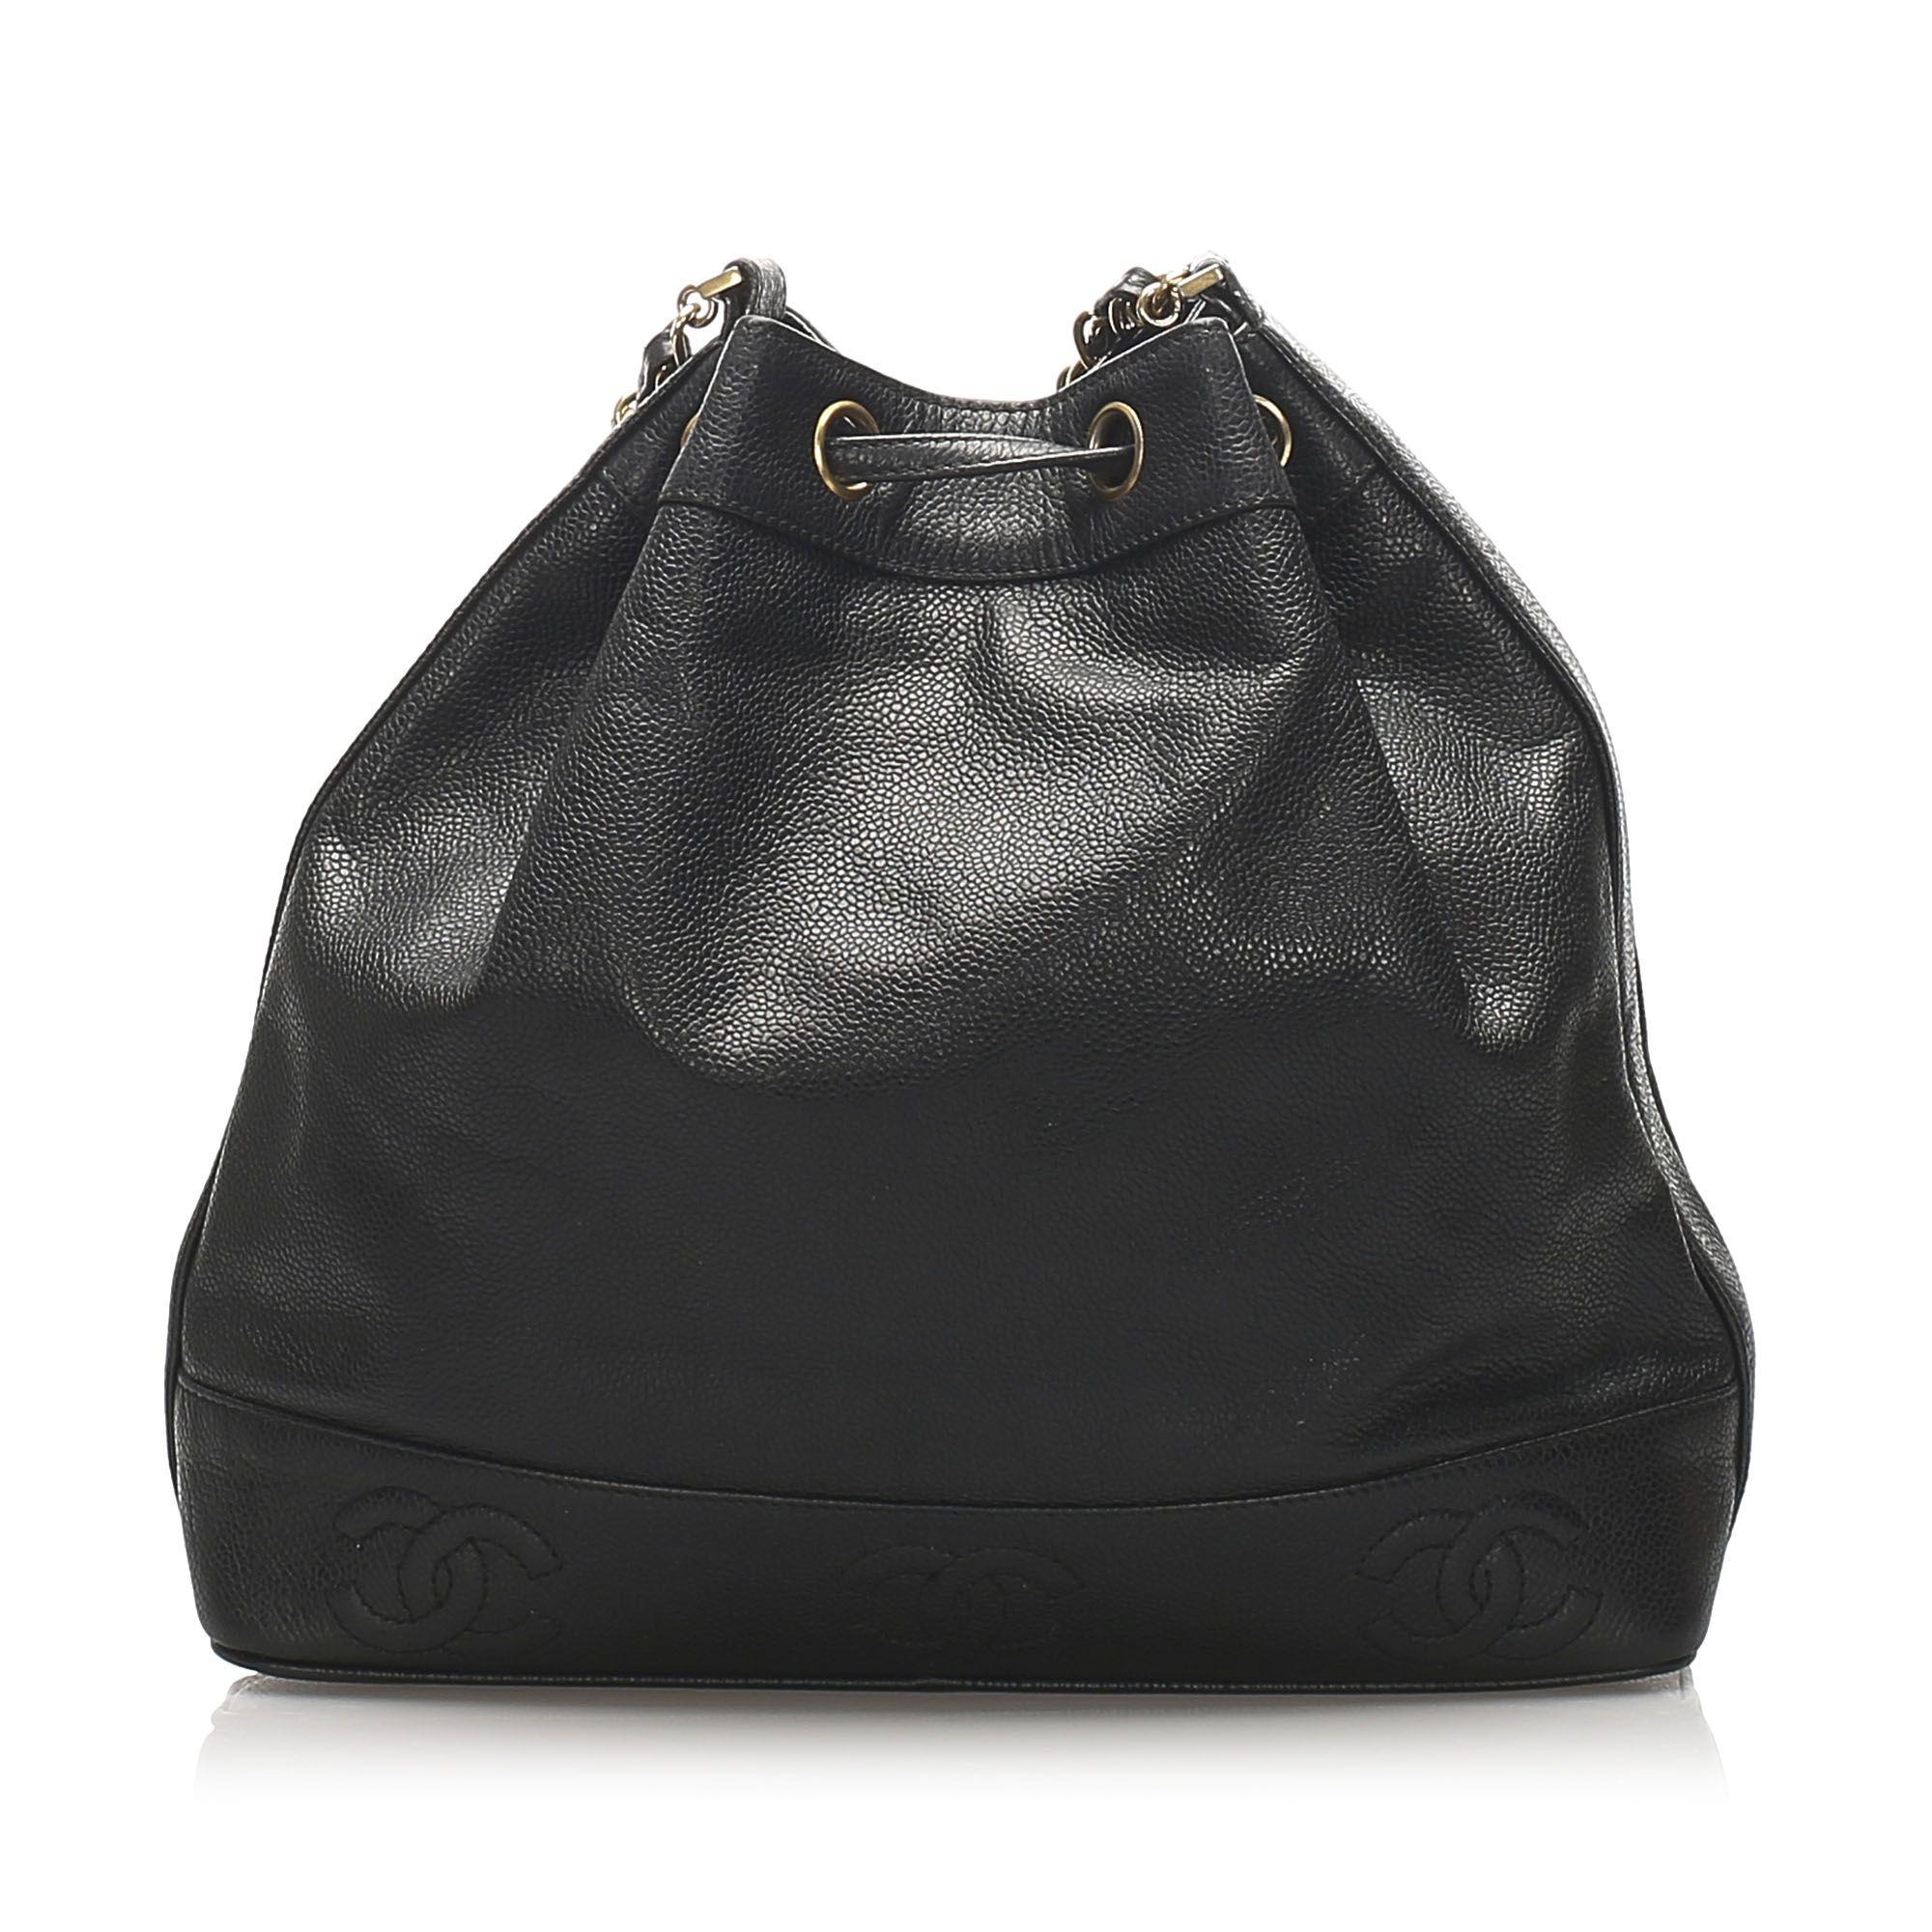 Vintage Chanel CC Lambskin Leather Bucket Bag Black